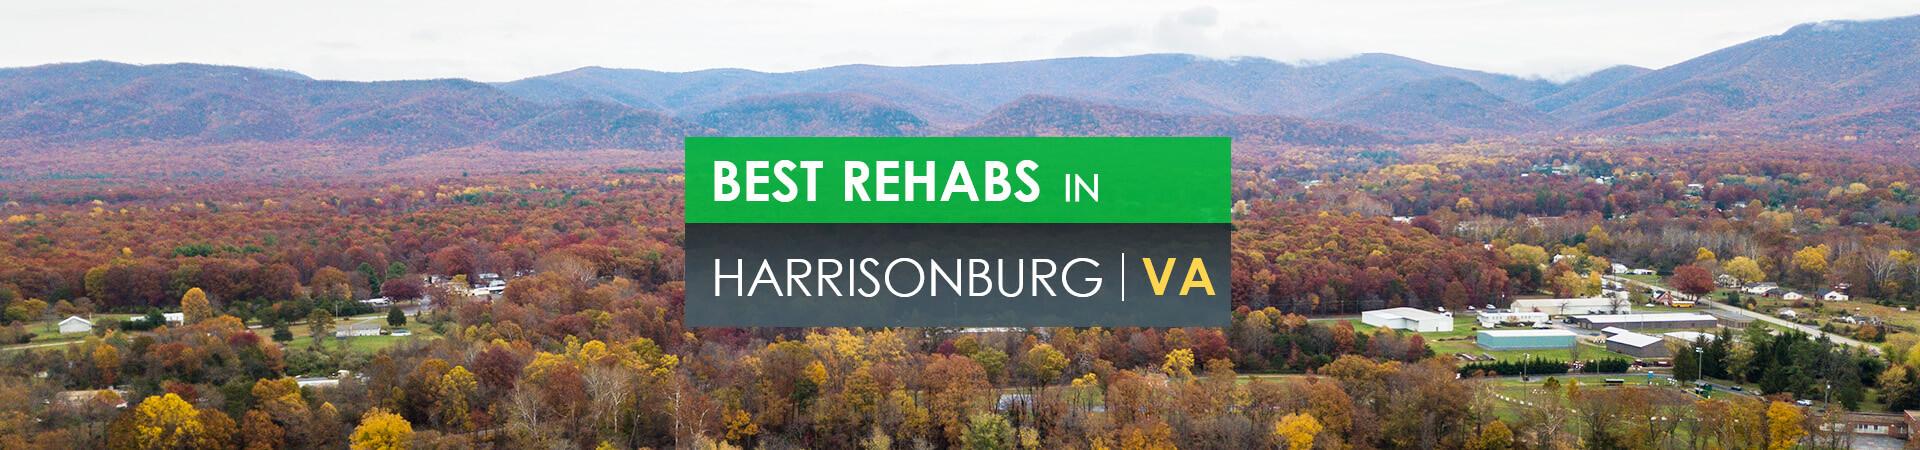 Best rehabs in Harrisonburg, VA